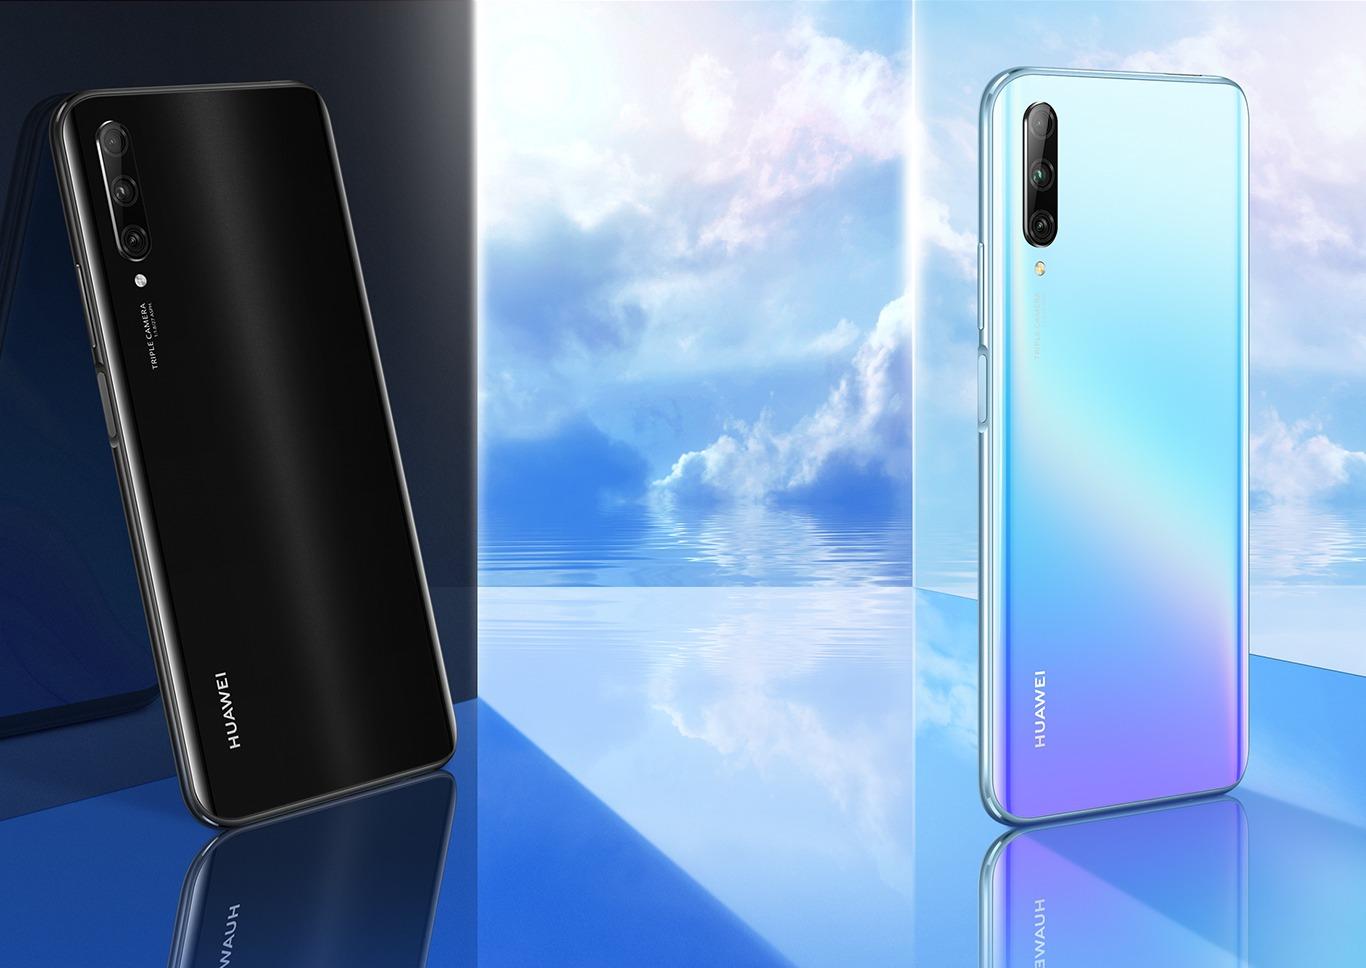 Antutu Benchmark of Huawei P smart Pro 2019 :: Kimovil.com